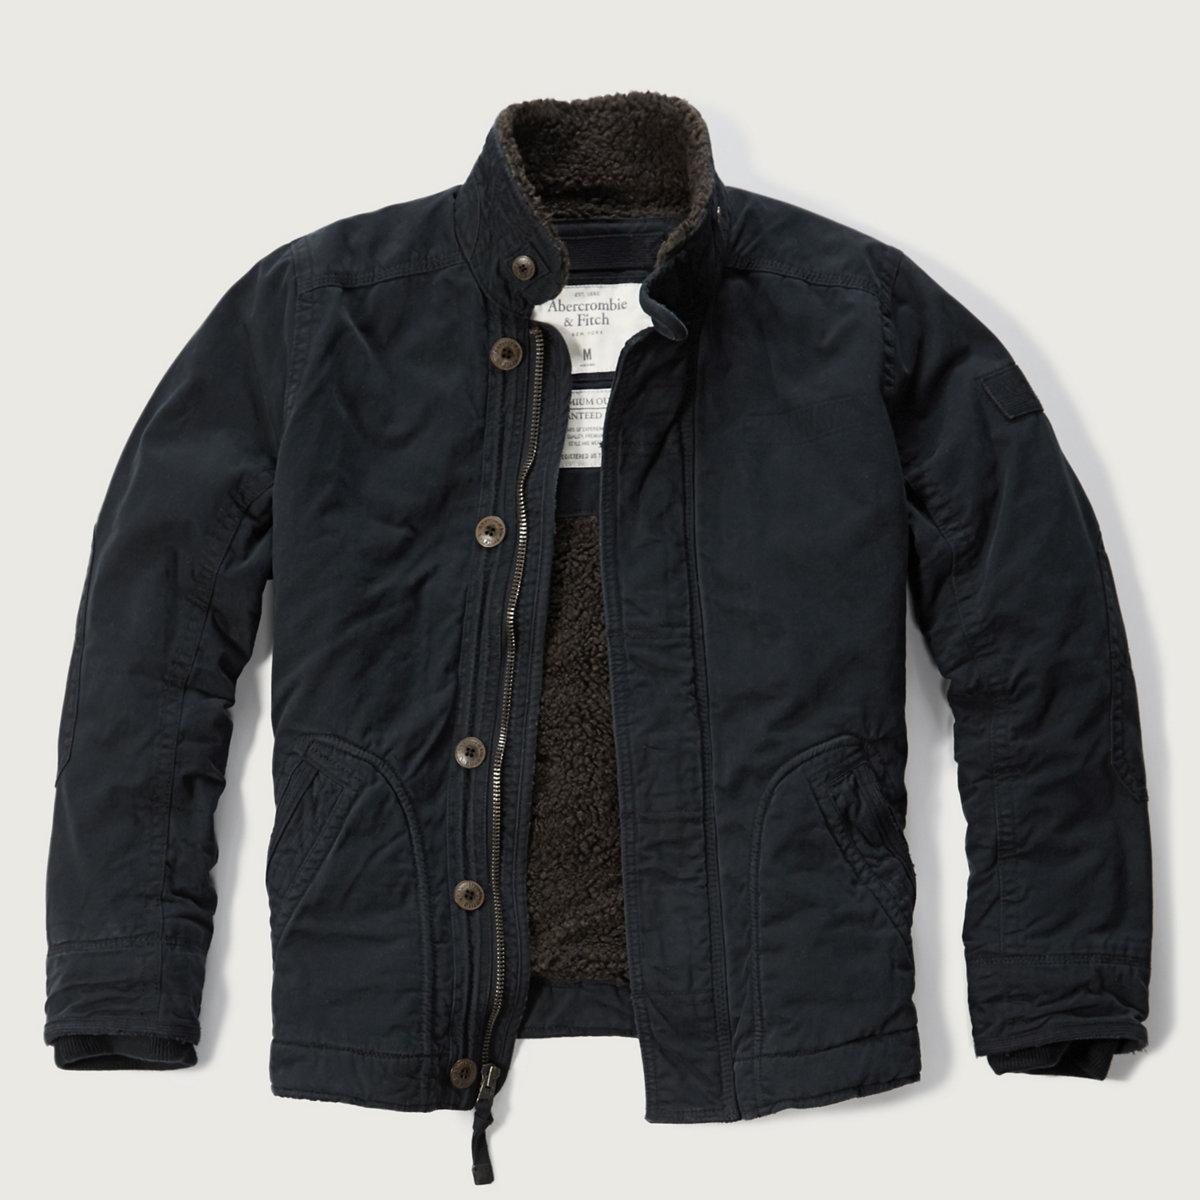 Sherpa Lined Utility Jacket